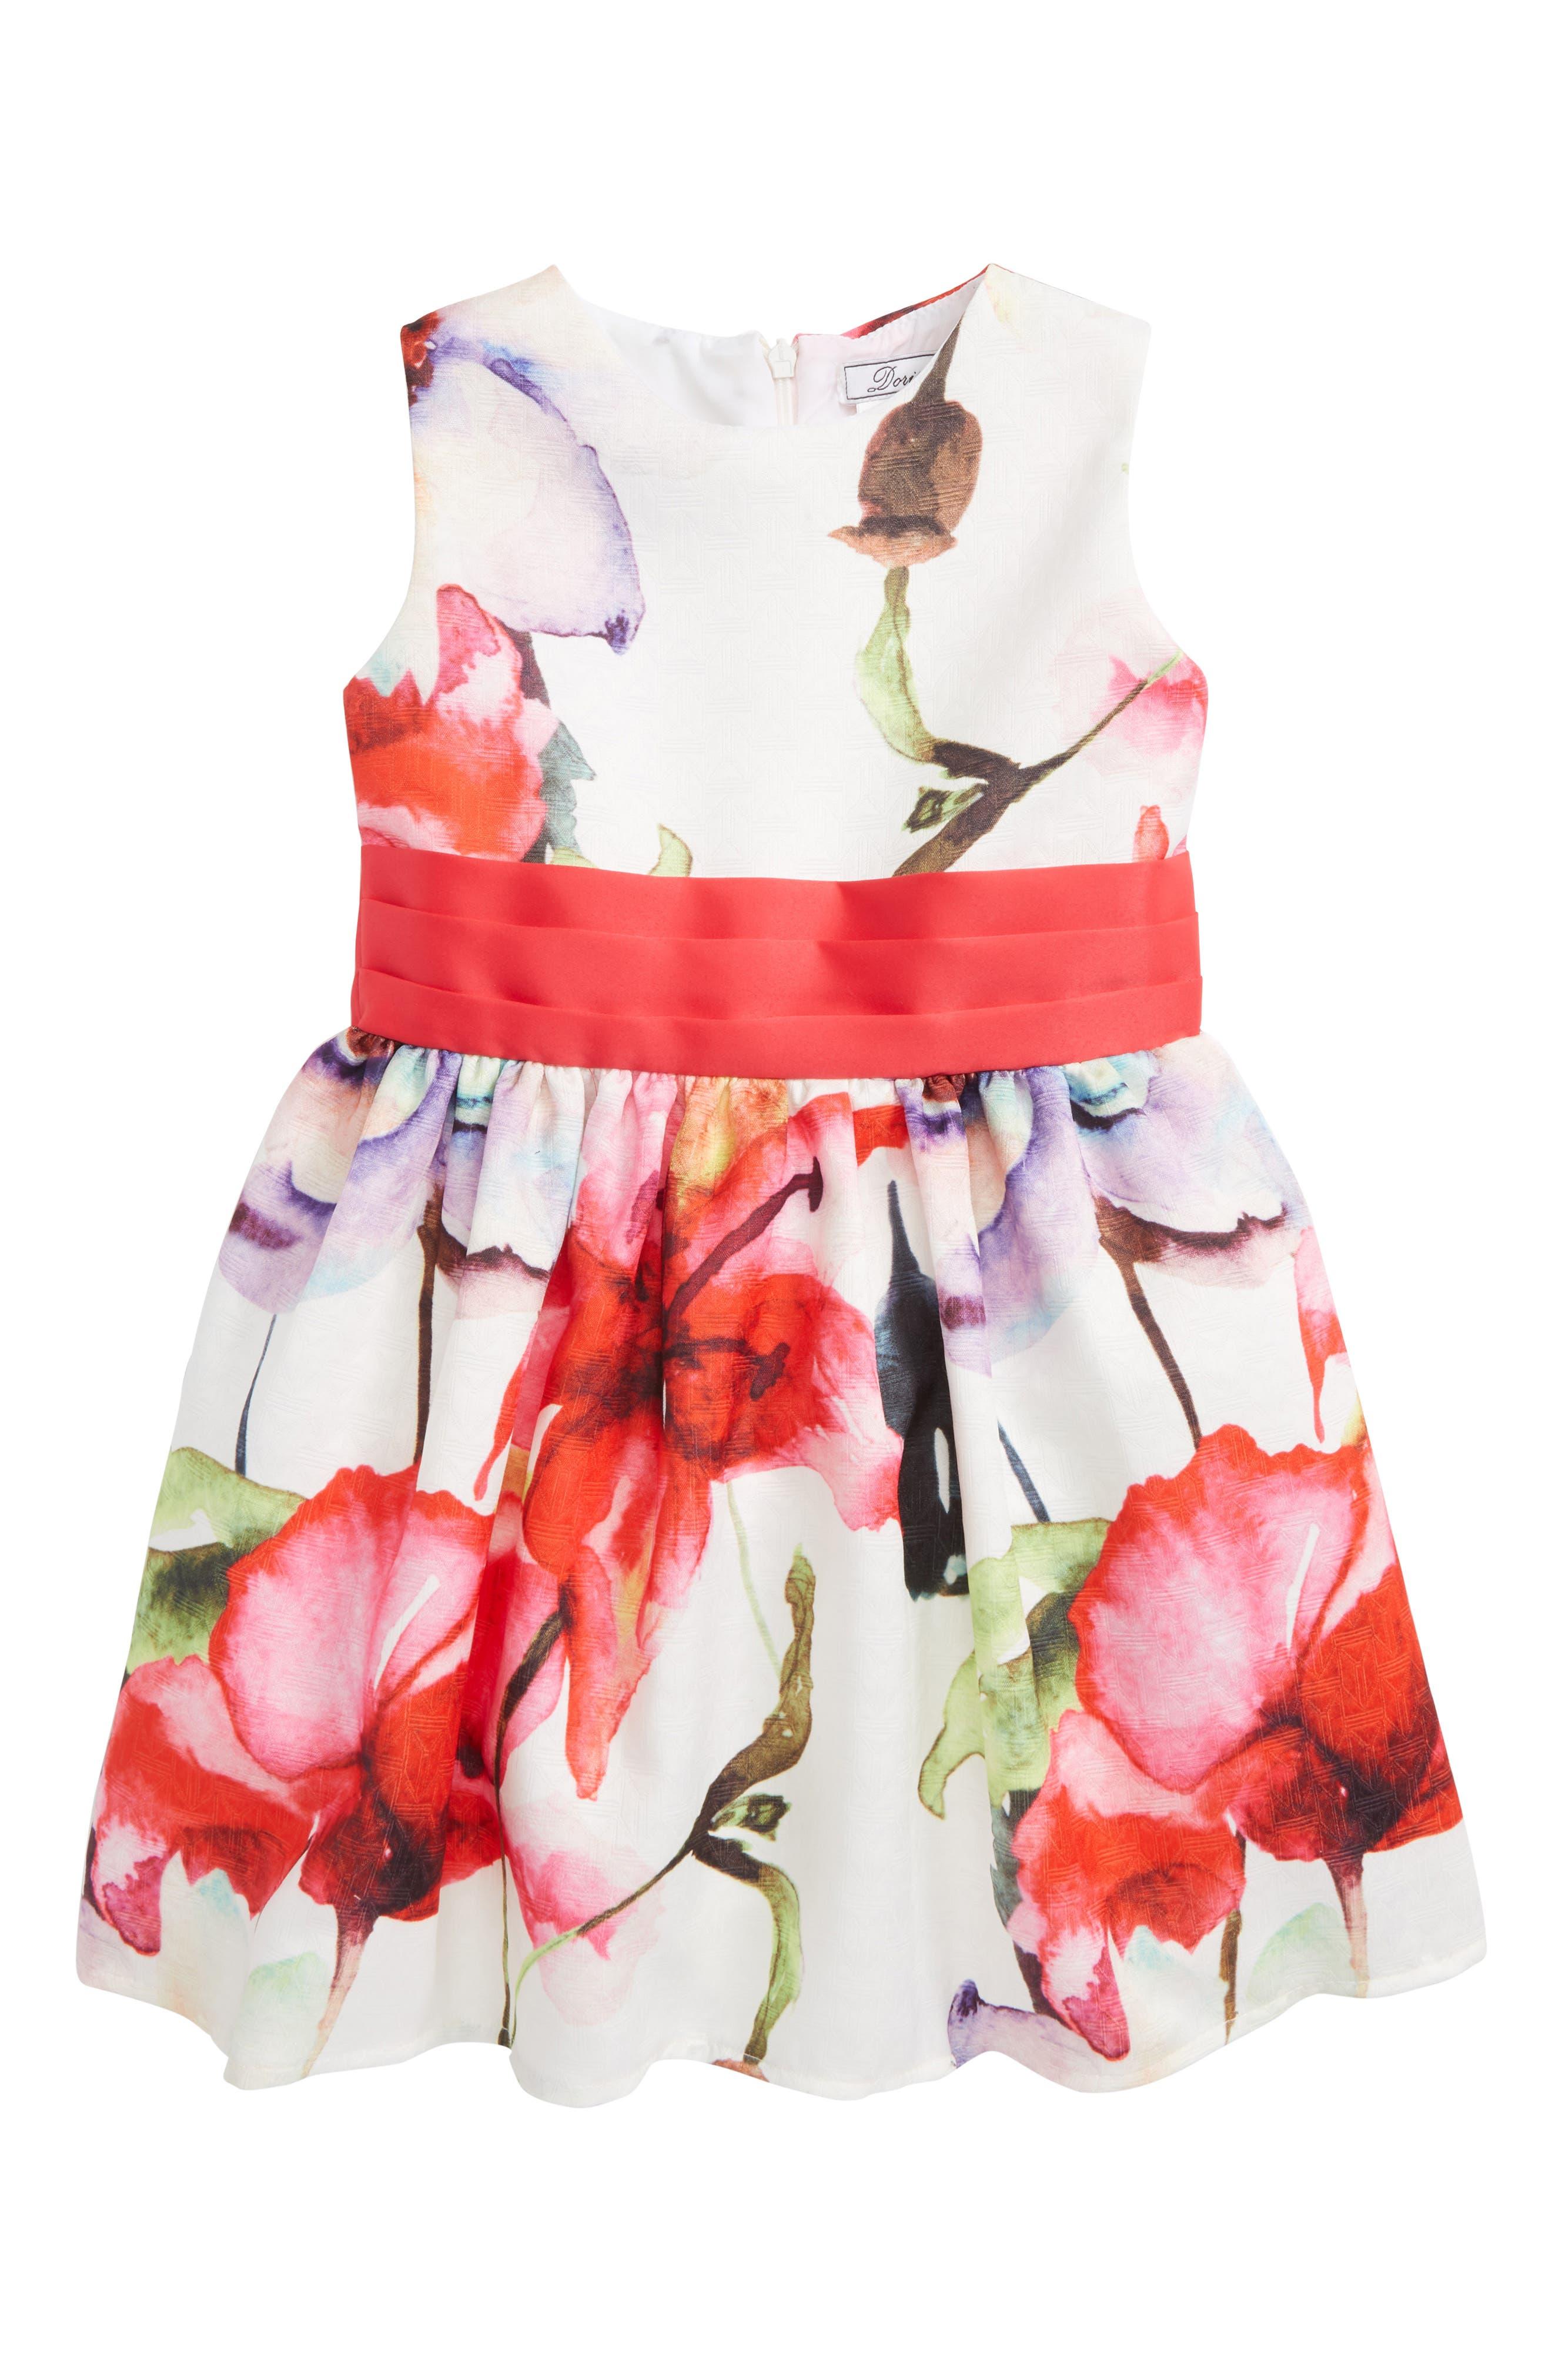 Alternate Image 1 Selected - Dorissa Laura Flower Party Dress (Baby Girls)